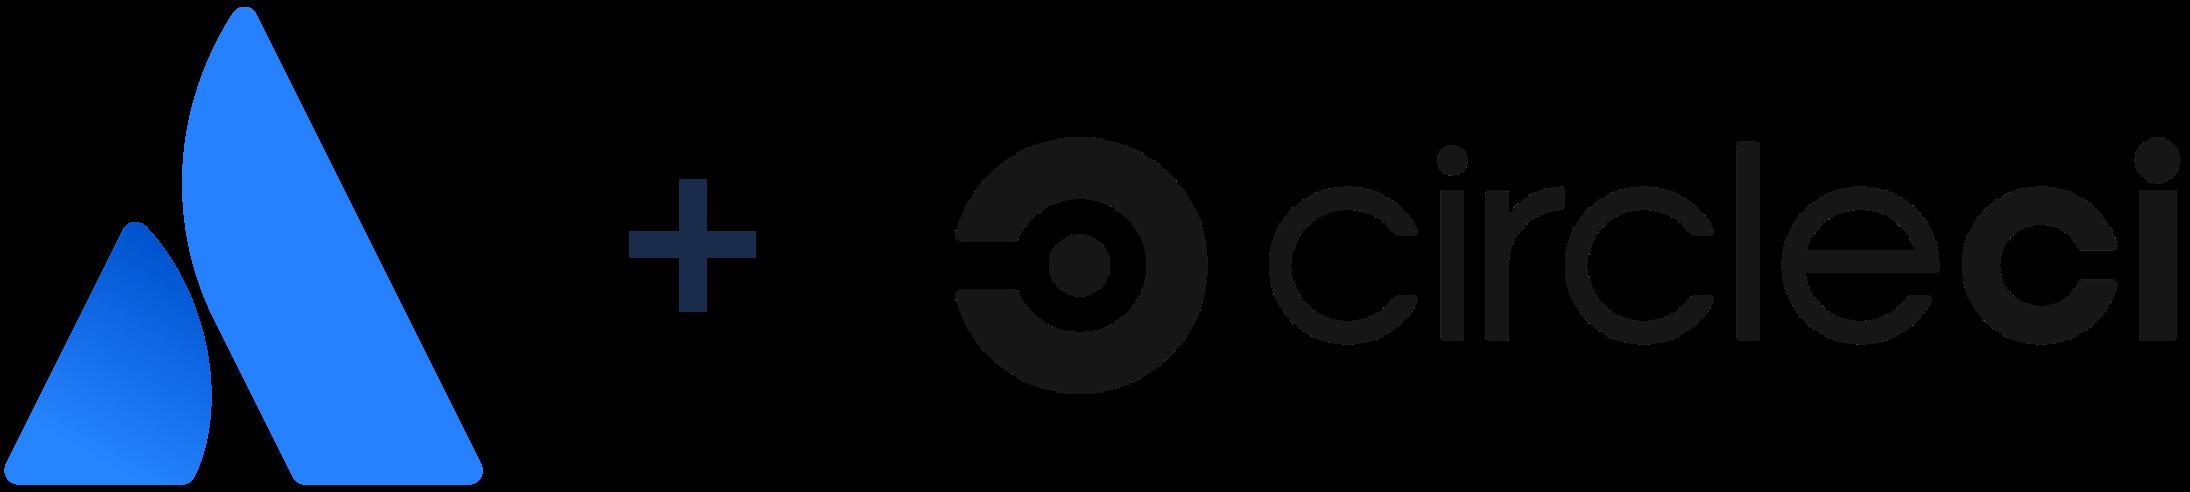 Atlassian 徽标 + CircleCI 徽标